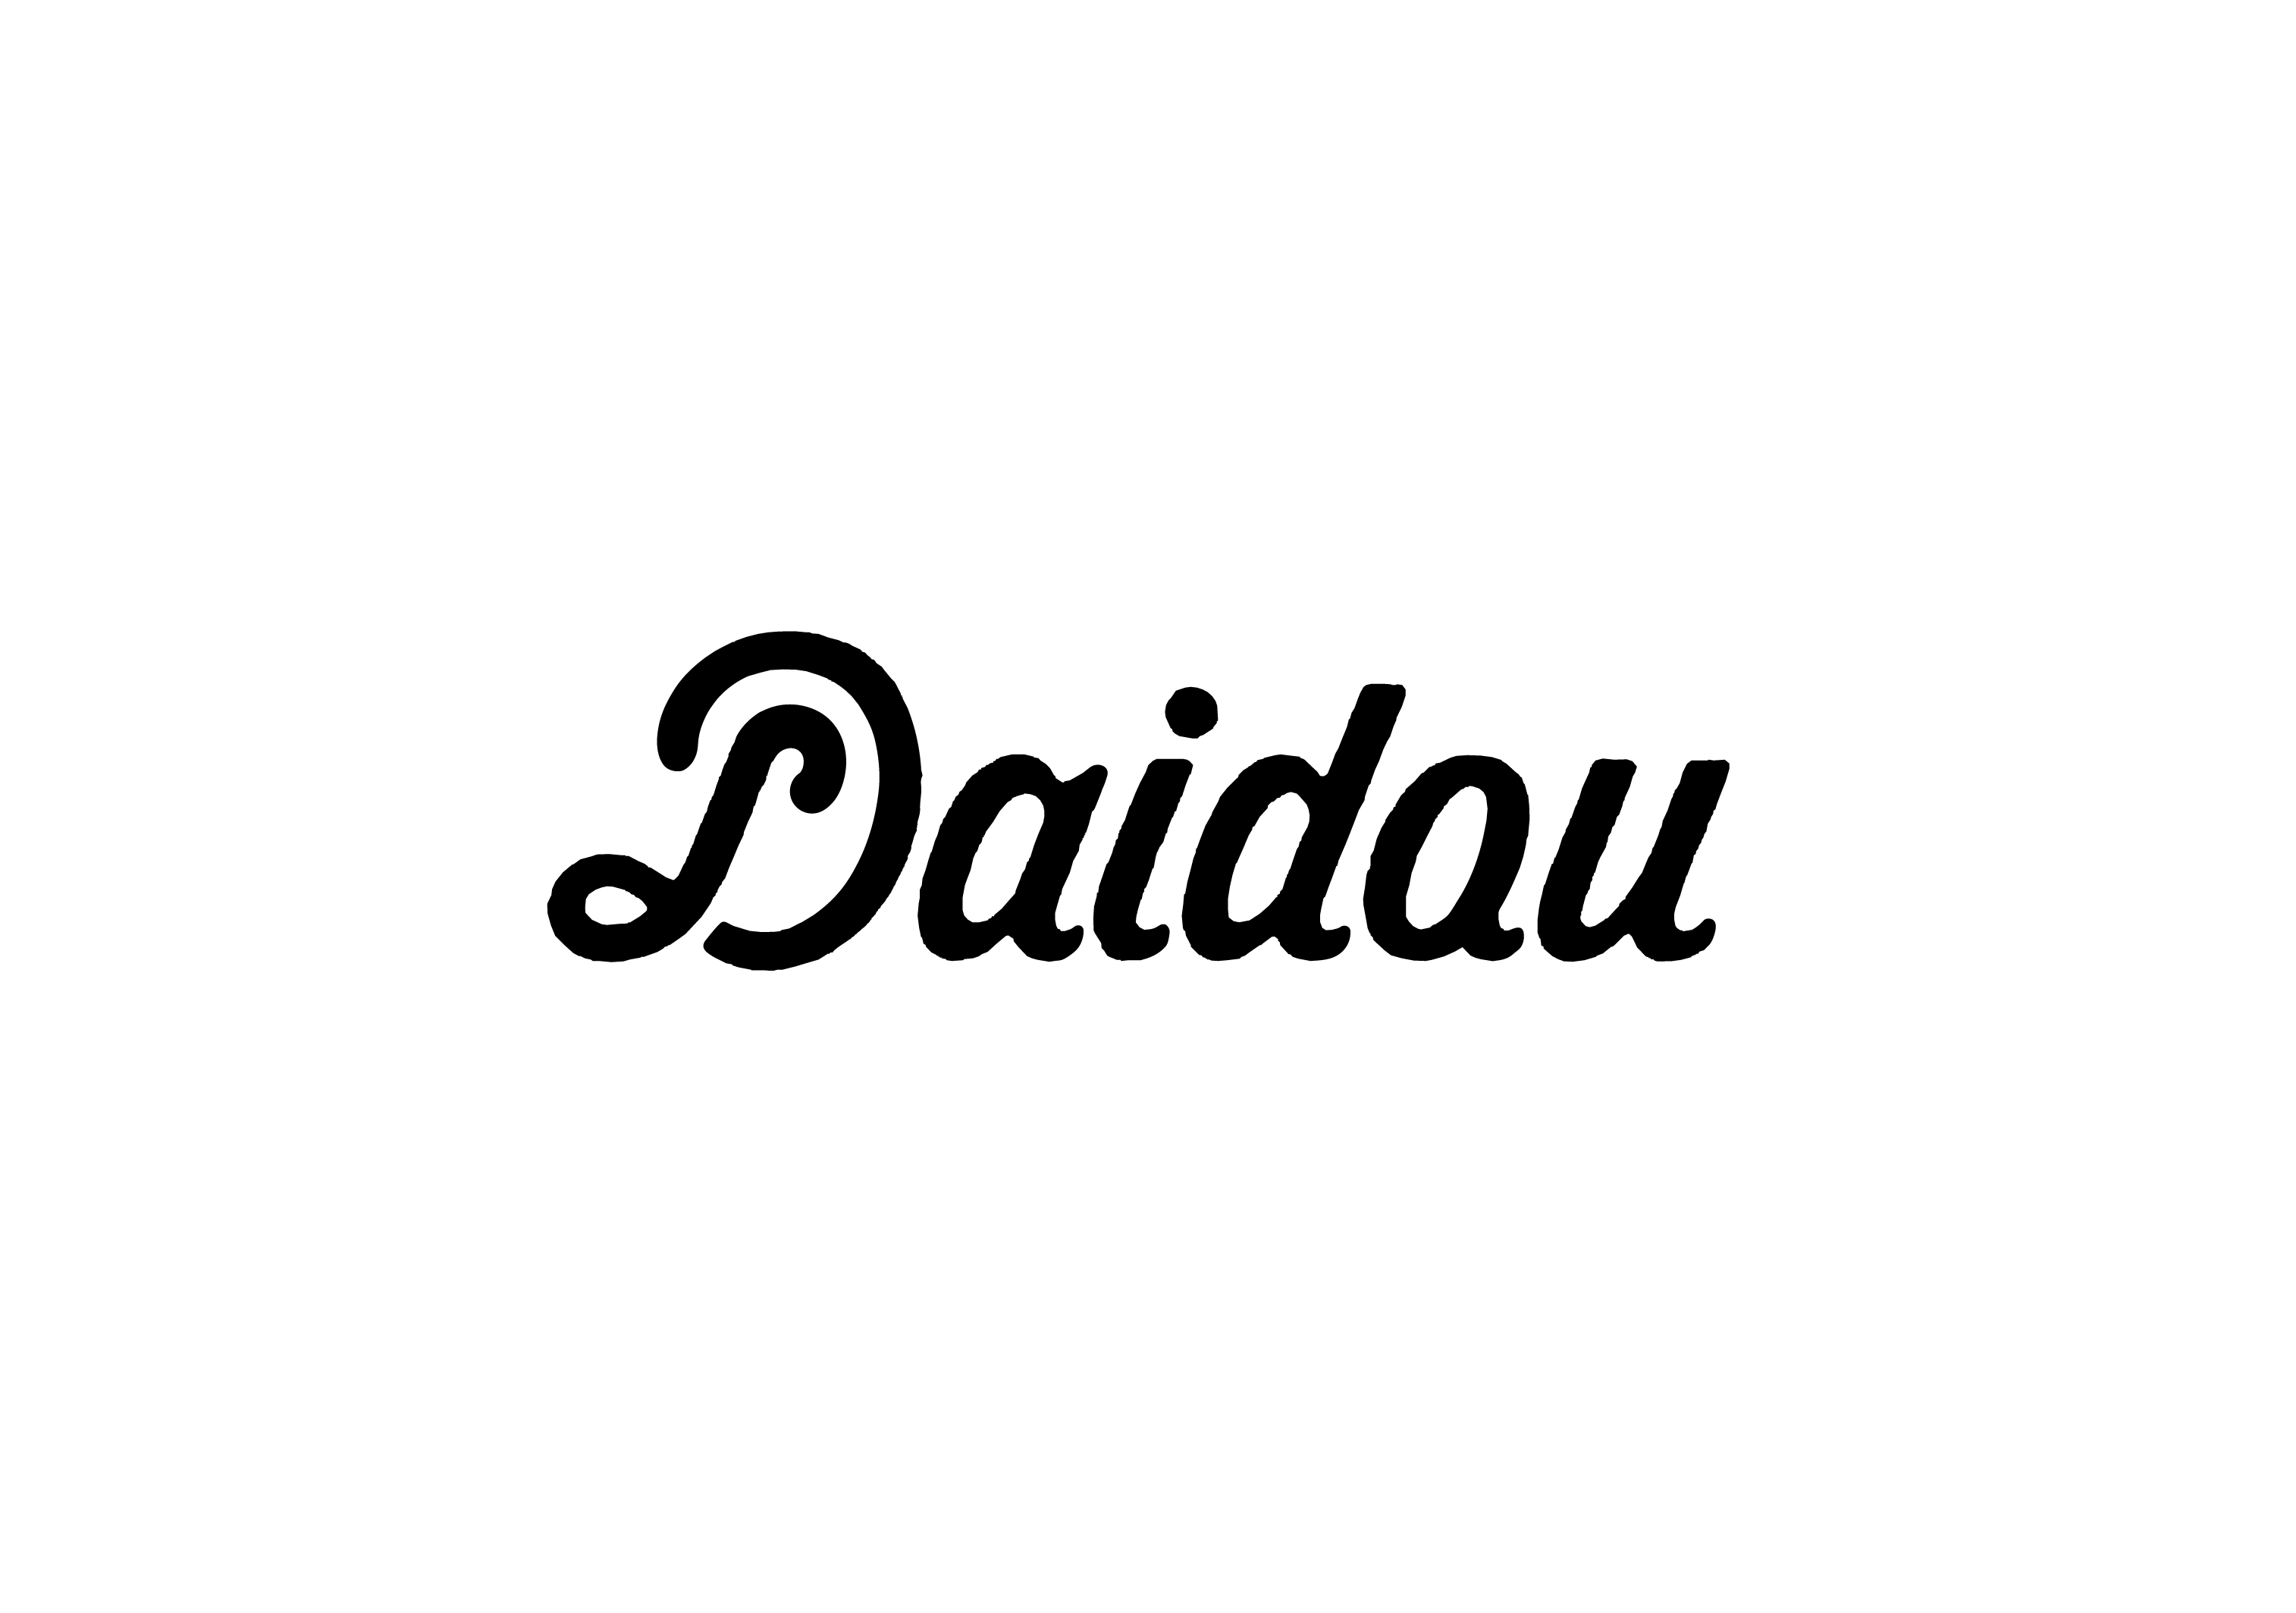 DAIDOUSHOP